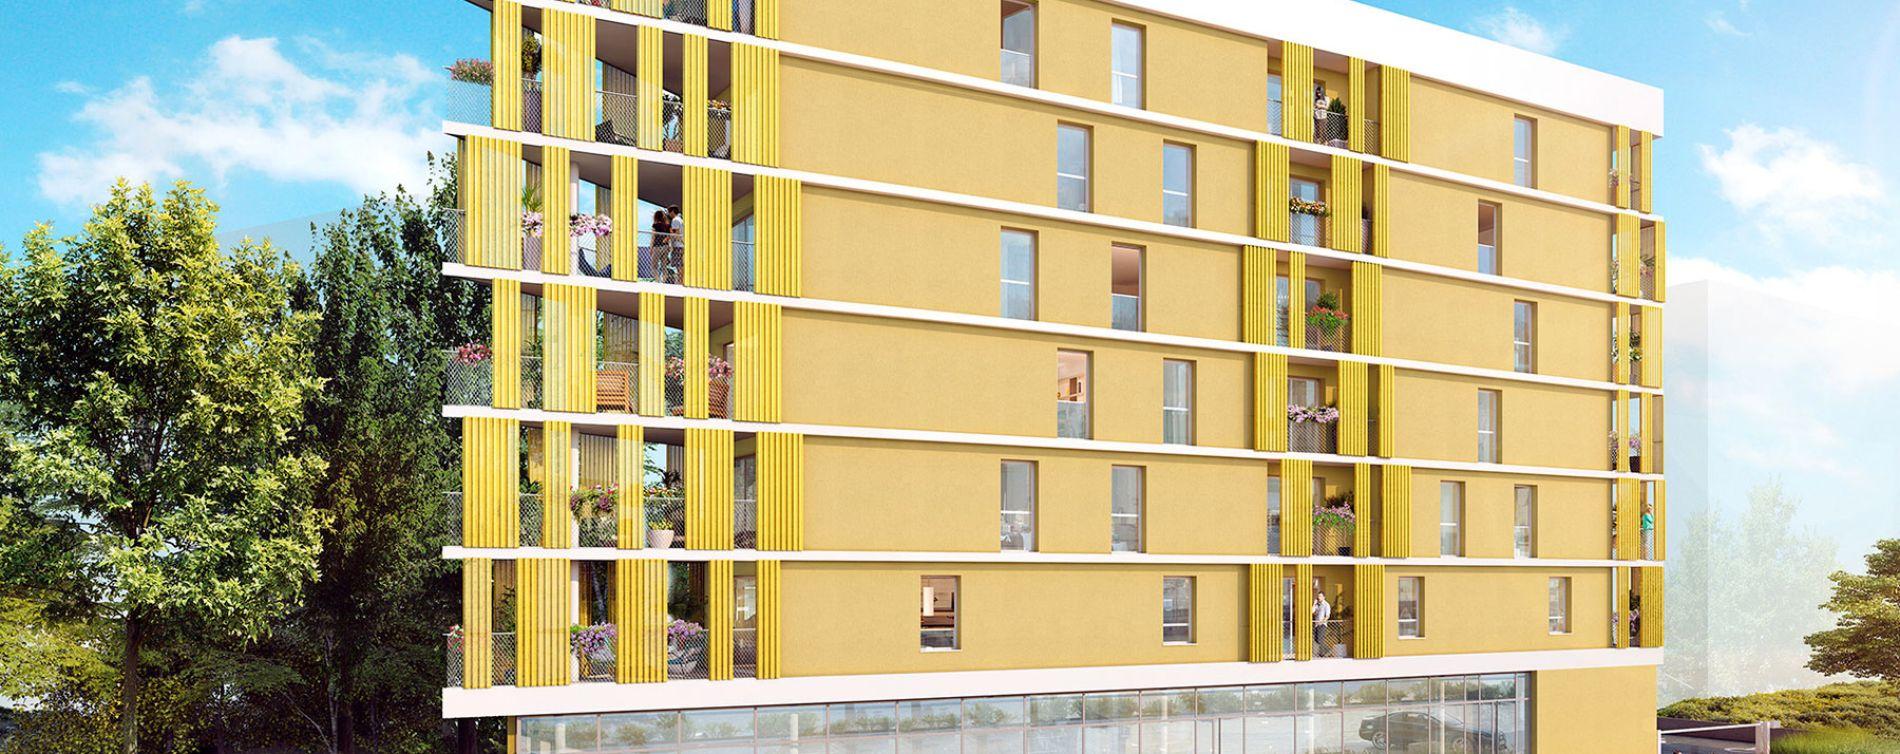 Résidence Ironflat à Nantes